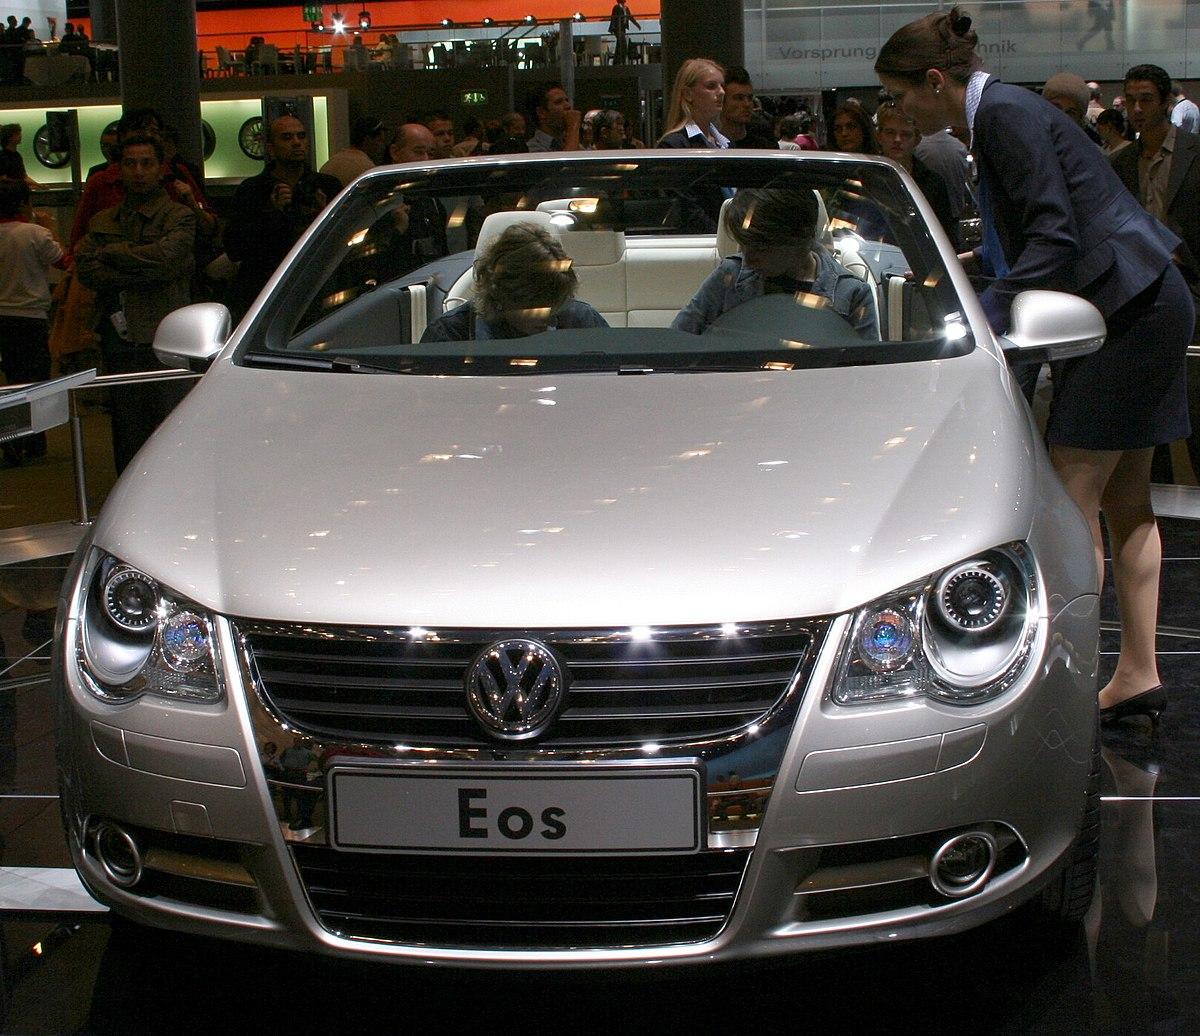 Volkswagen Eos Wikipedia - Eos car show